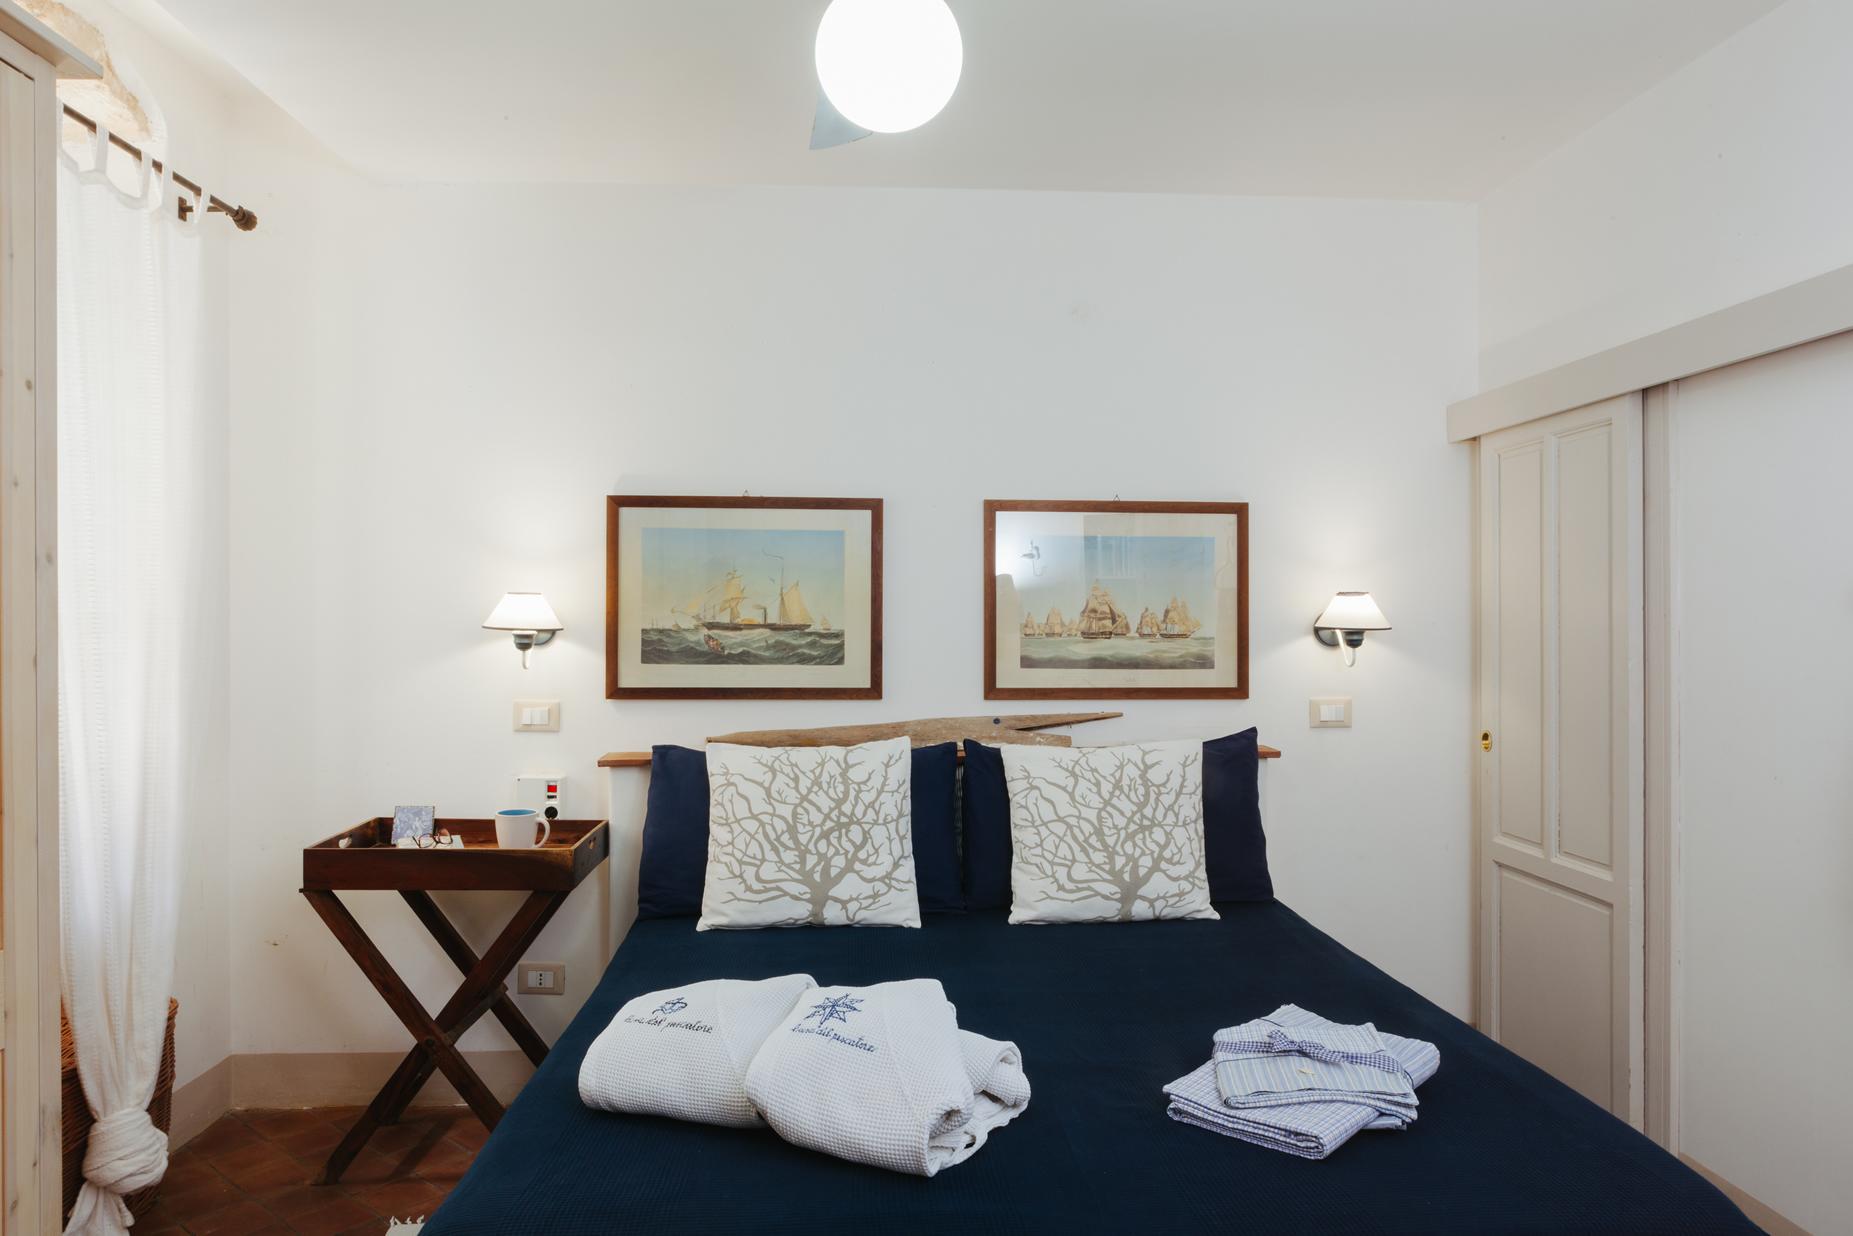 7sampieri-casa-vacanze-sicilia-appartamento-sicily-holiday-apartment-casa-del-pescatore-italia-italy.jpg